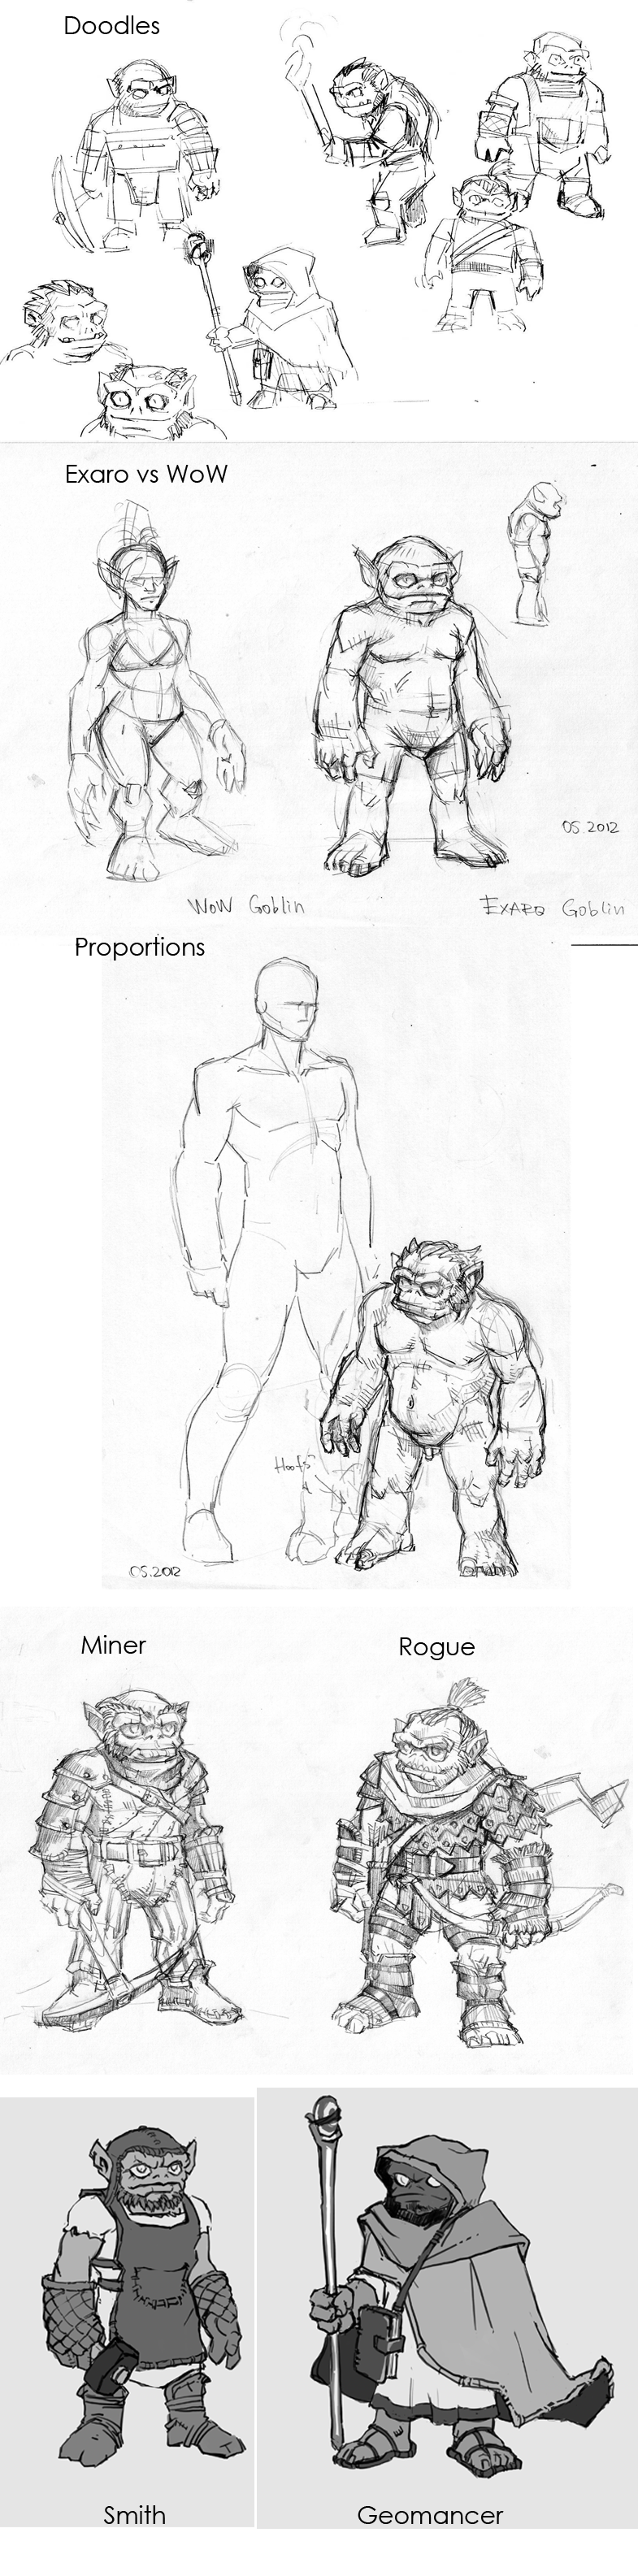 goblins conceptart by Balabanov